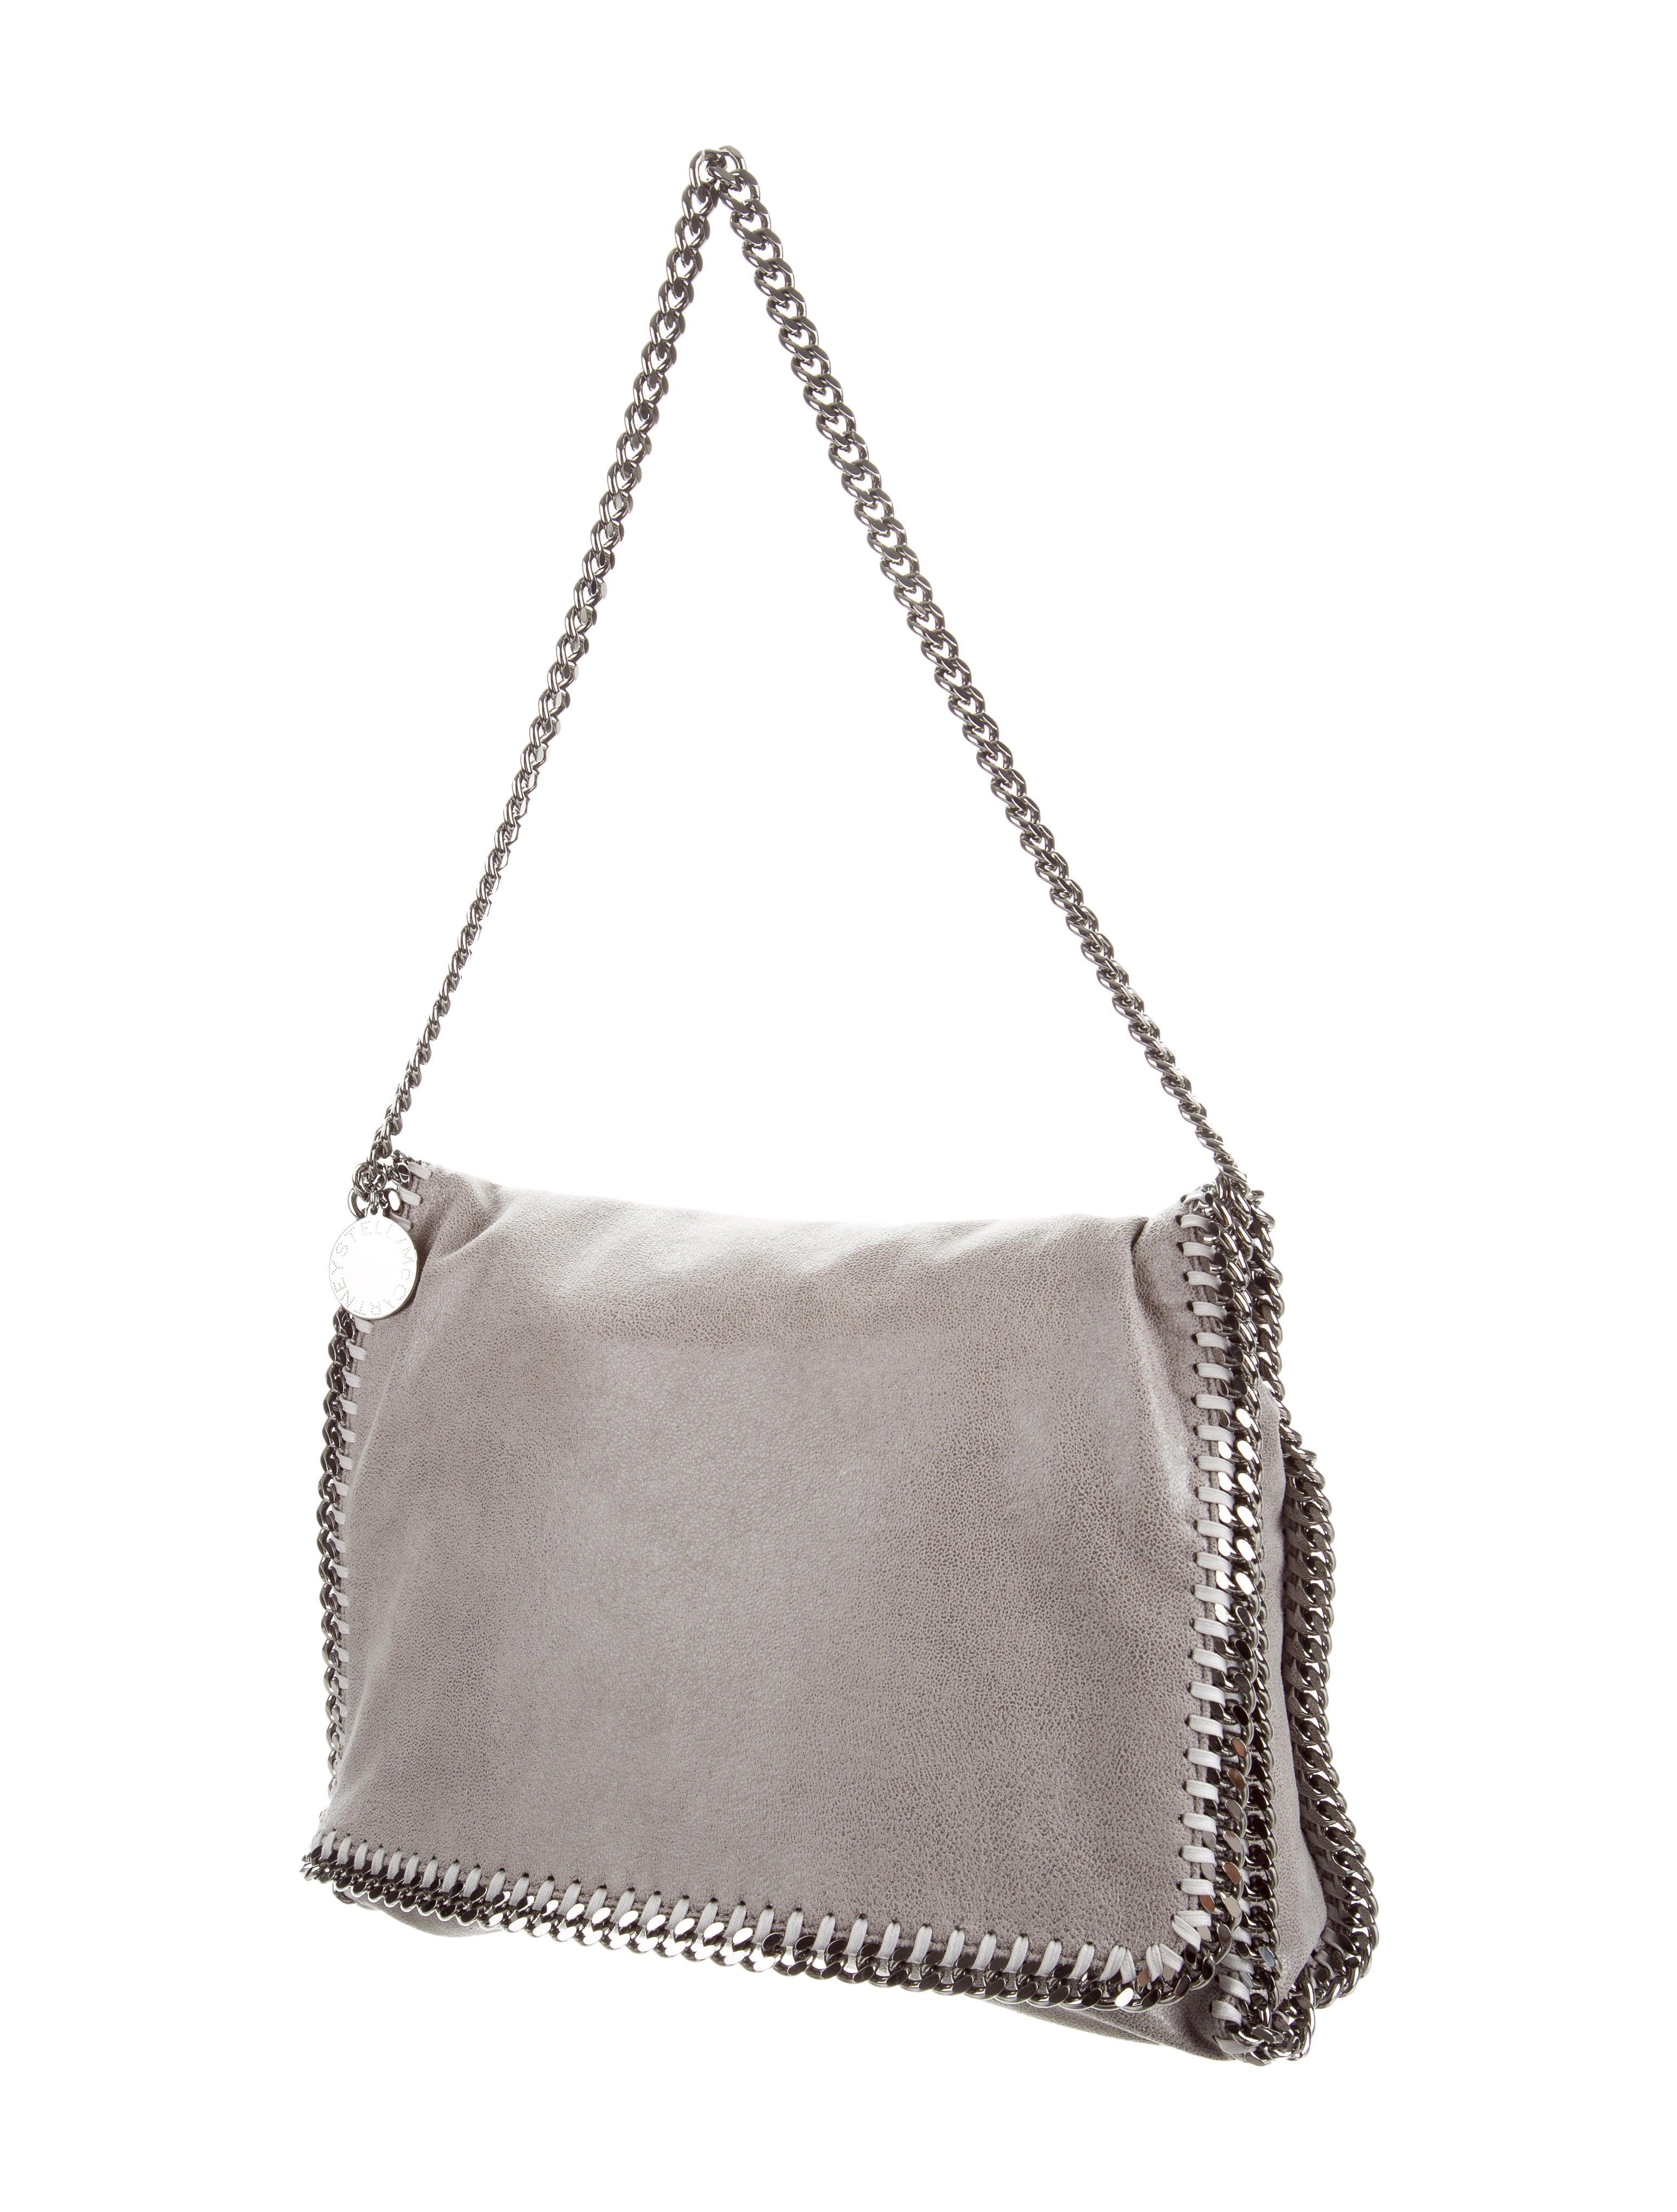 stella mccartney falabella flap bag handbags stl51913 the realreal. Black Bedroom Furniture Sets. Home Design Ideas